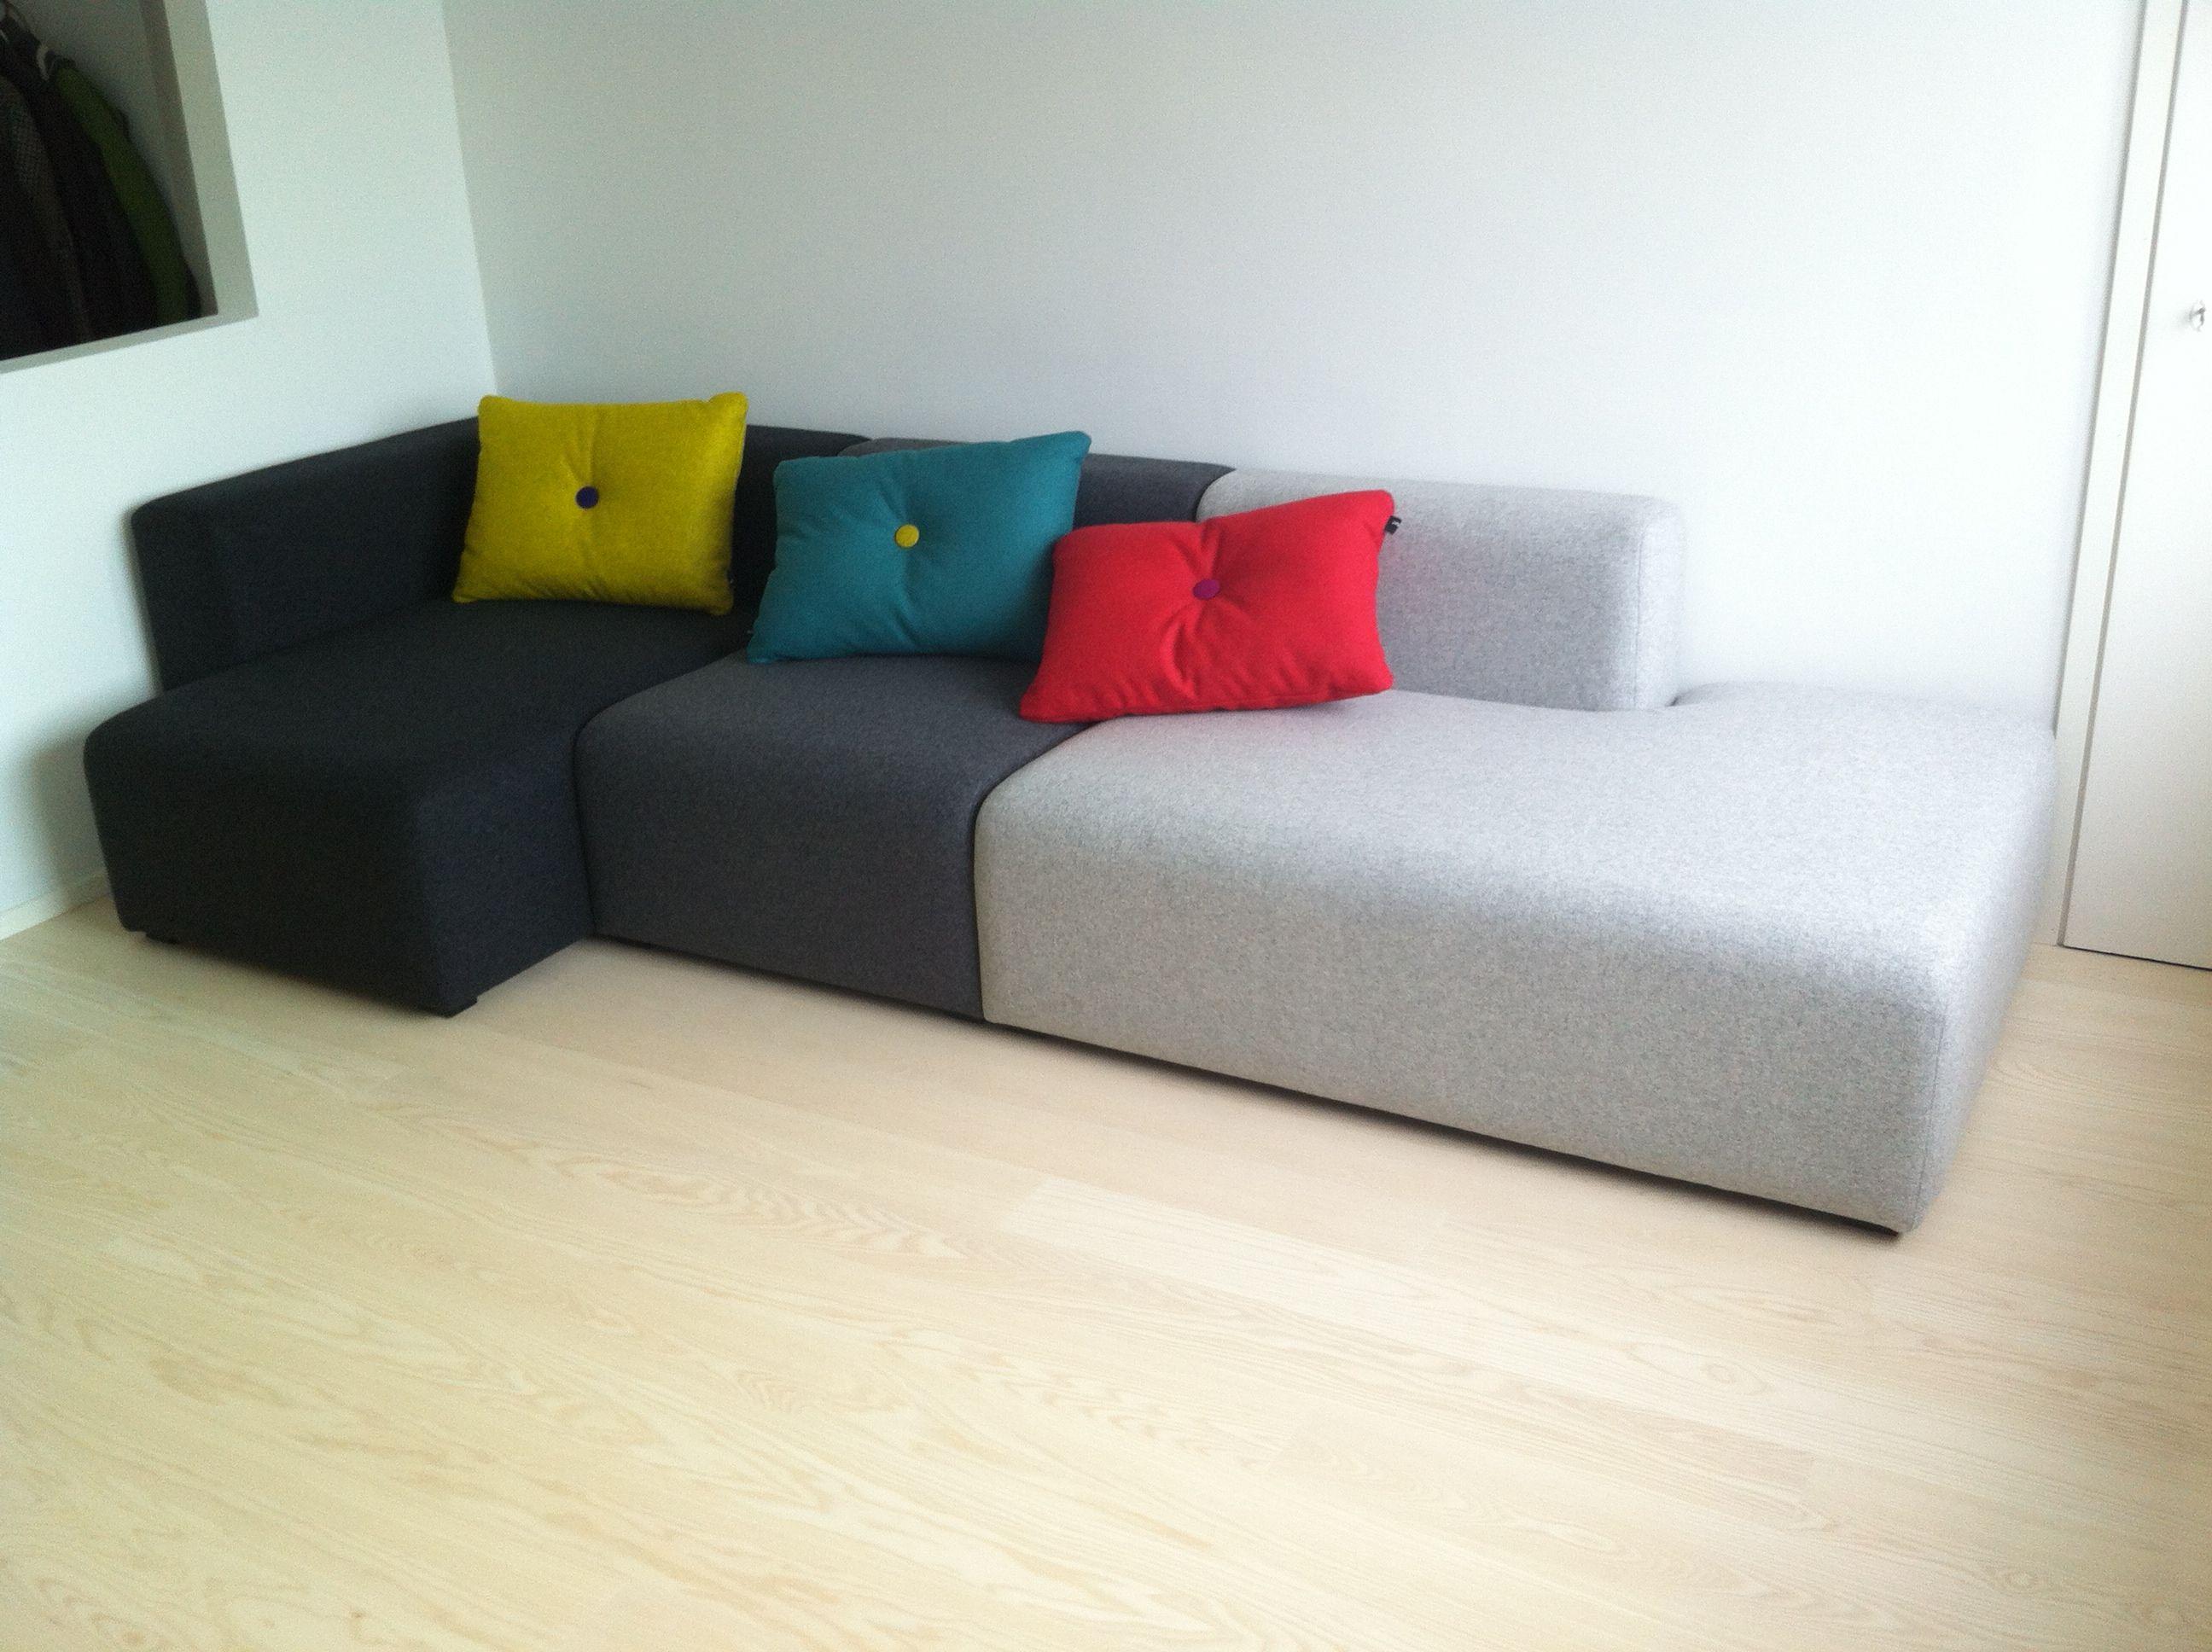 Mags Sofa Hay : Hay mags sofa sofa home decor home